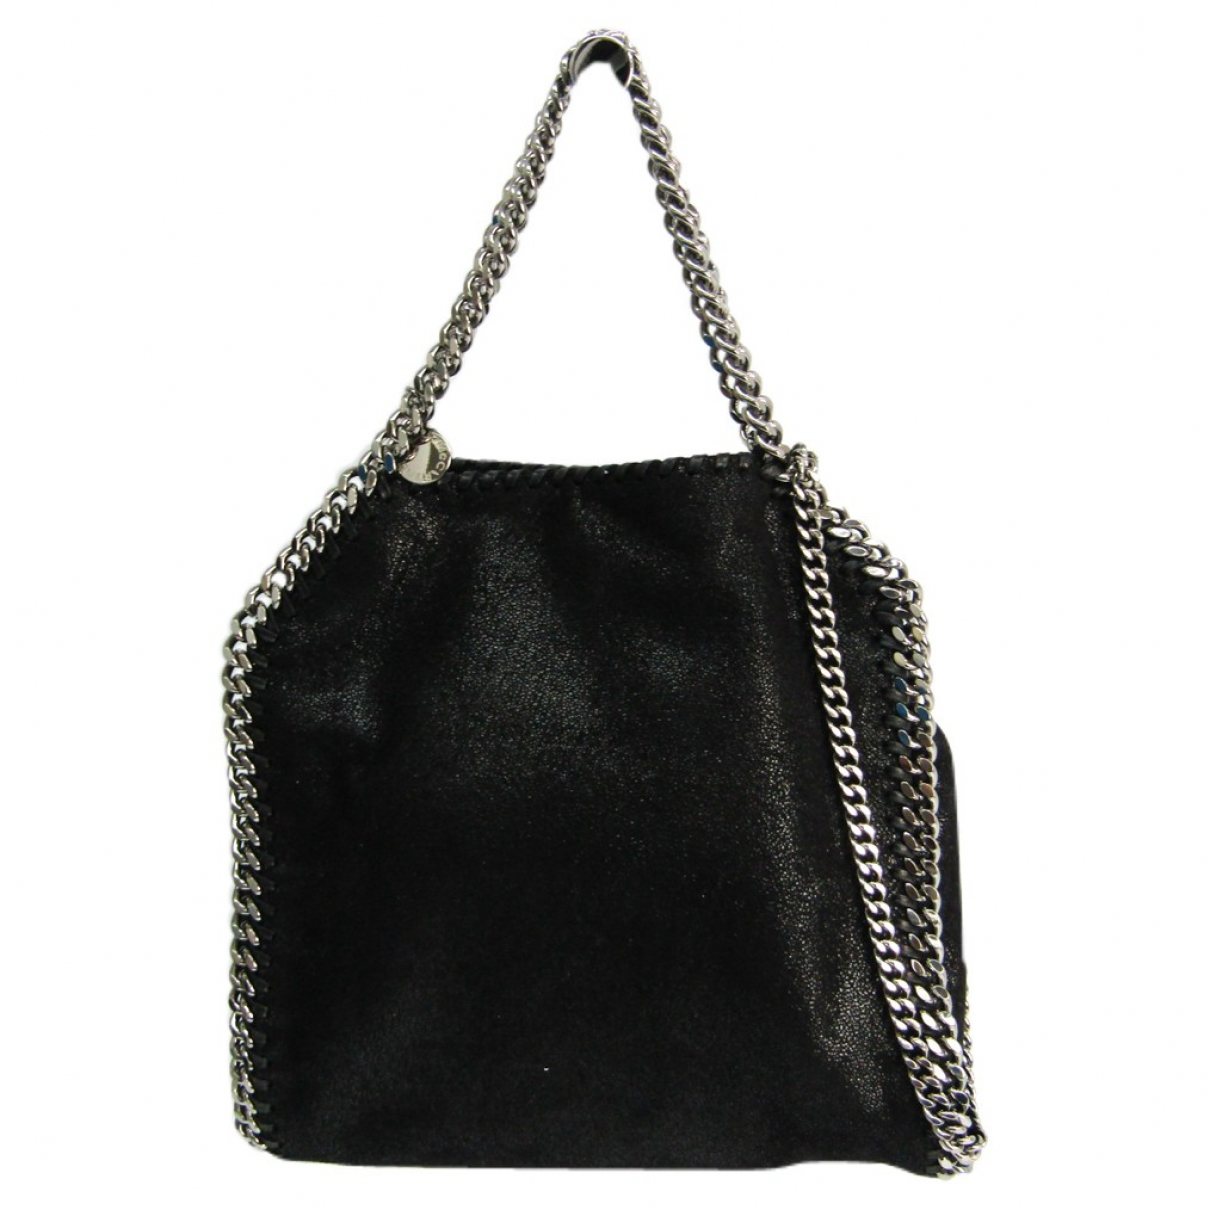 Stella Mccartney N Black handbag for Women N